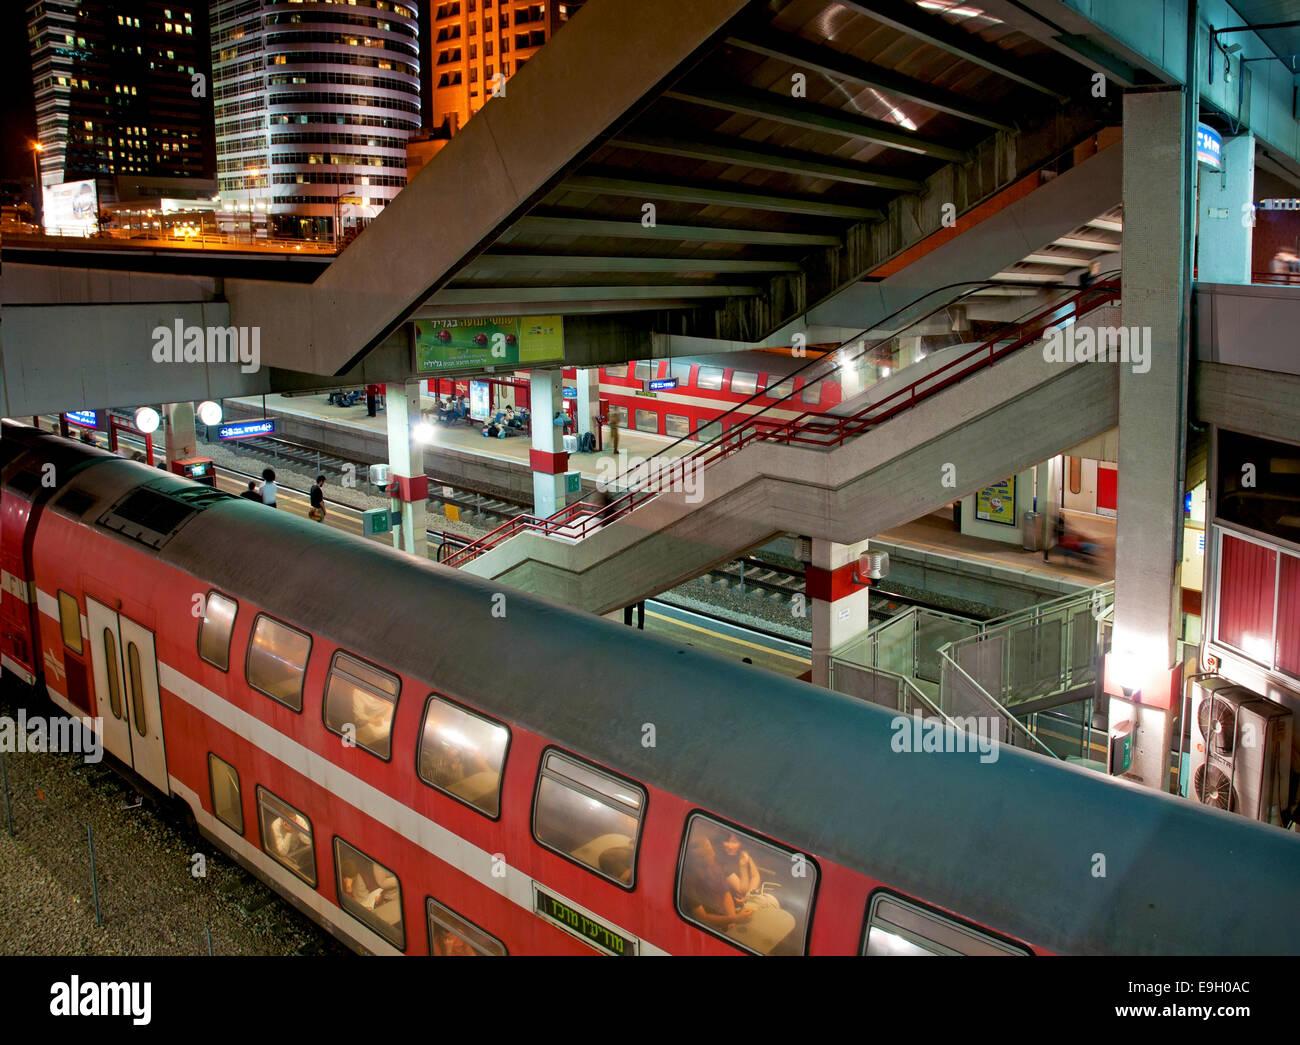 Central train station, Tel Aviv at night - Stock Image